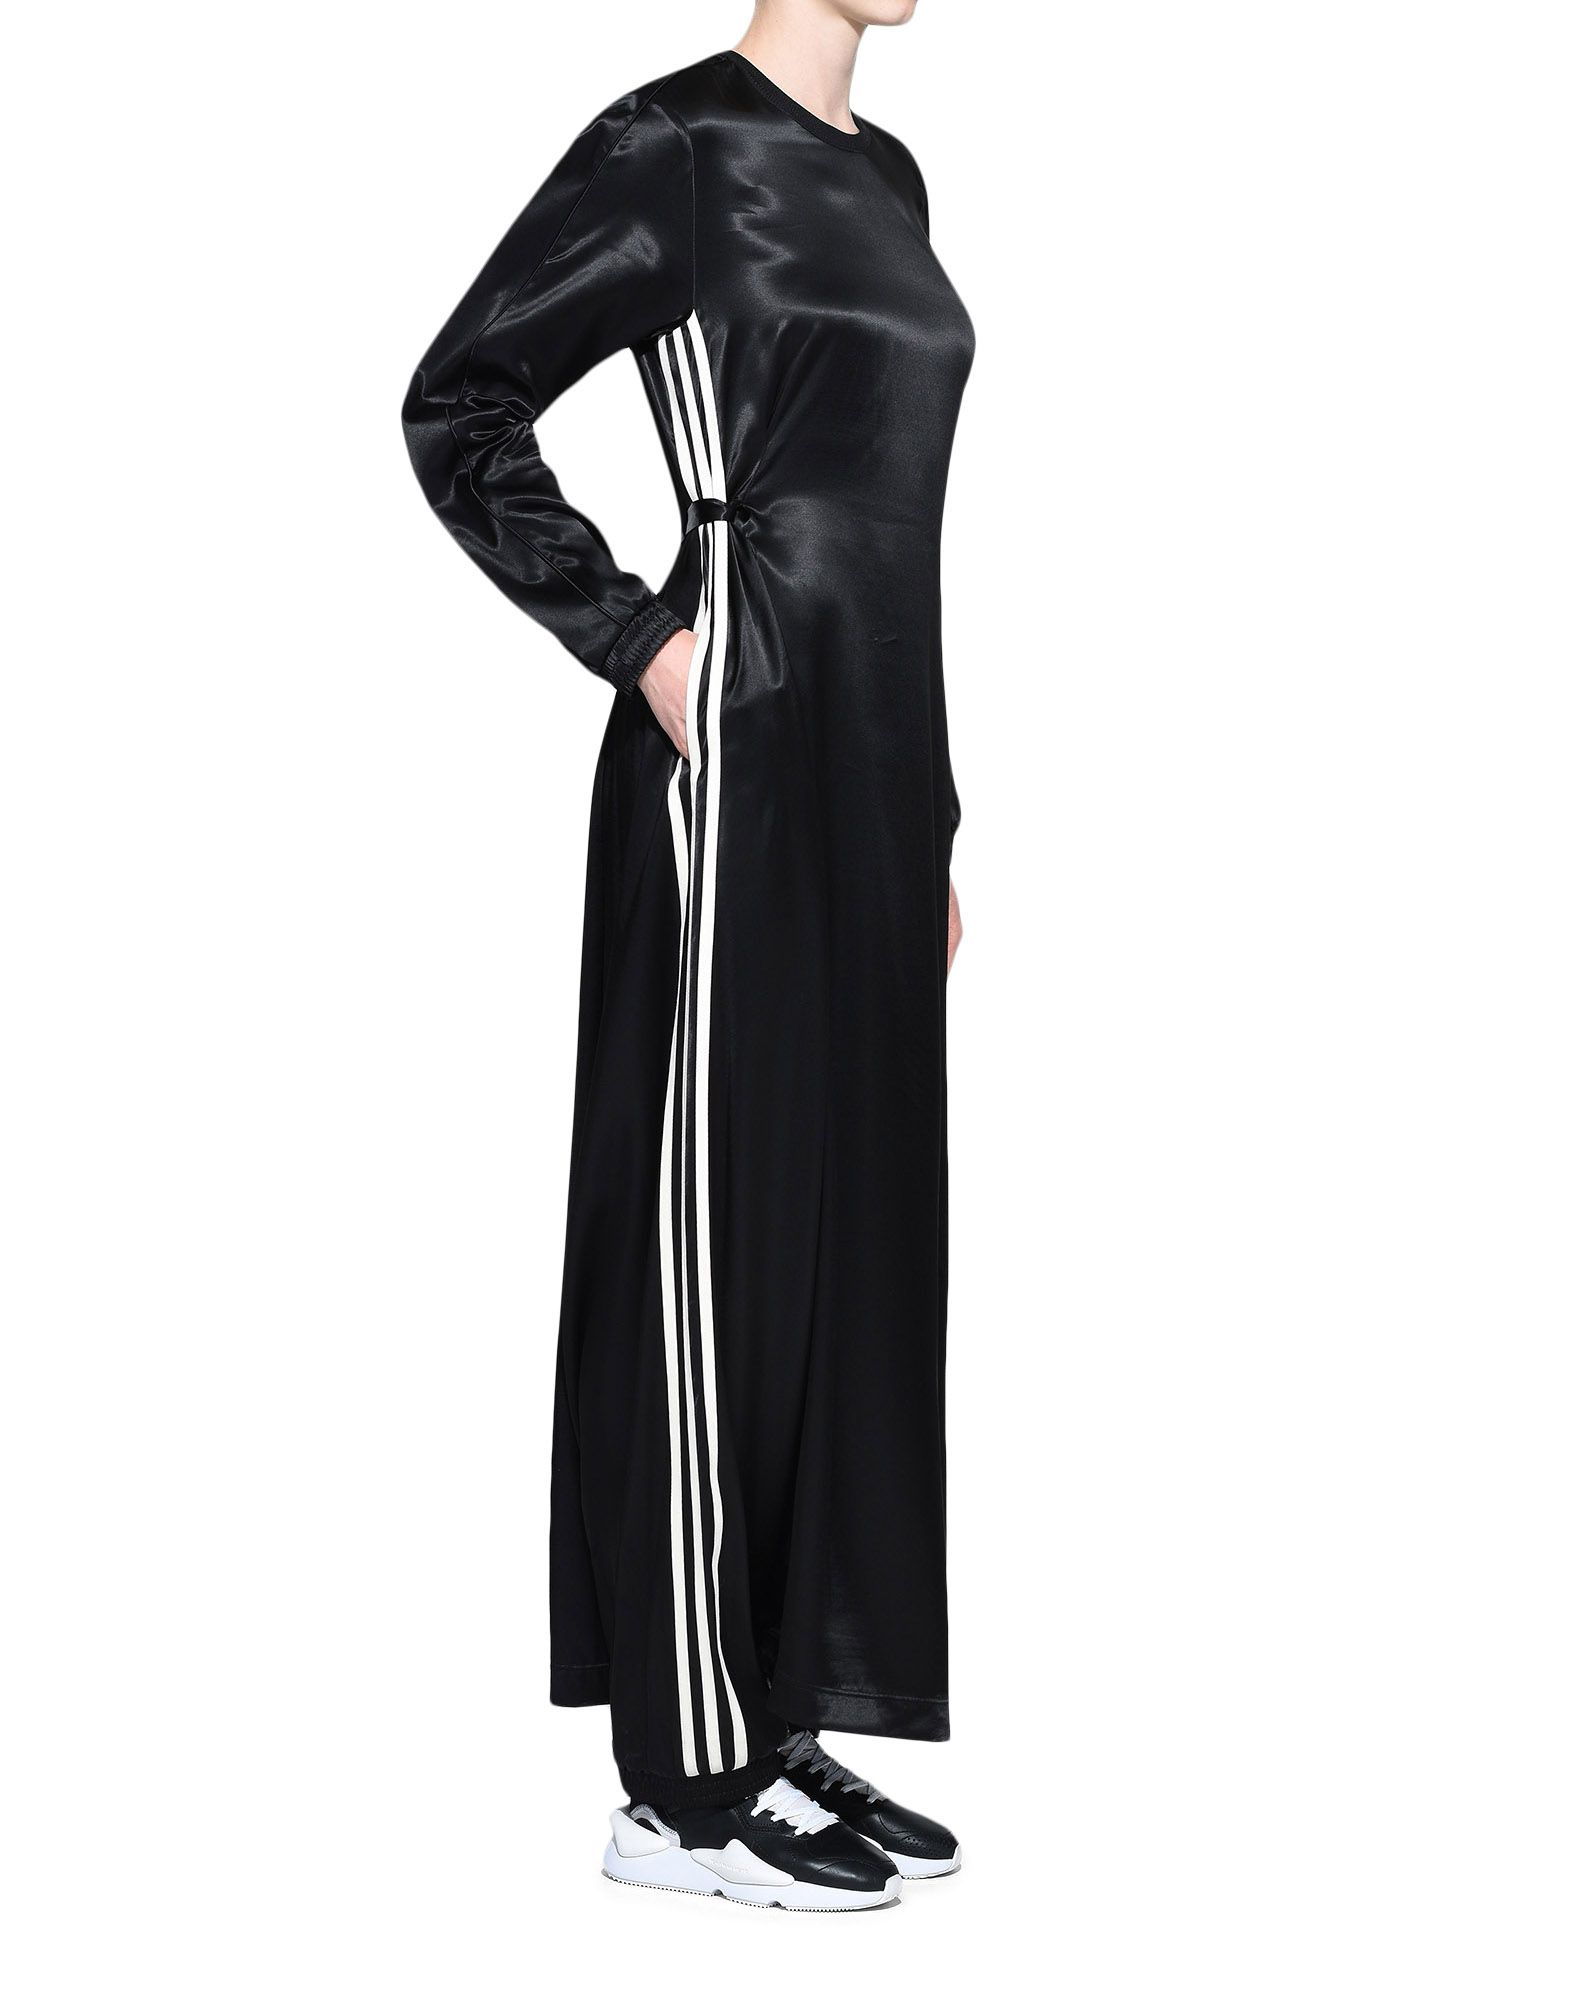 Y-3 Y-3 3-Stripes Lux Track Dress Длинное платье Для Женщин e